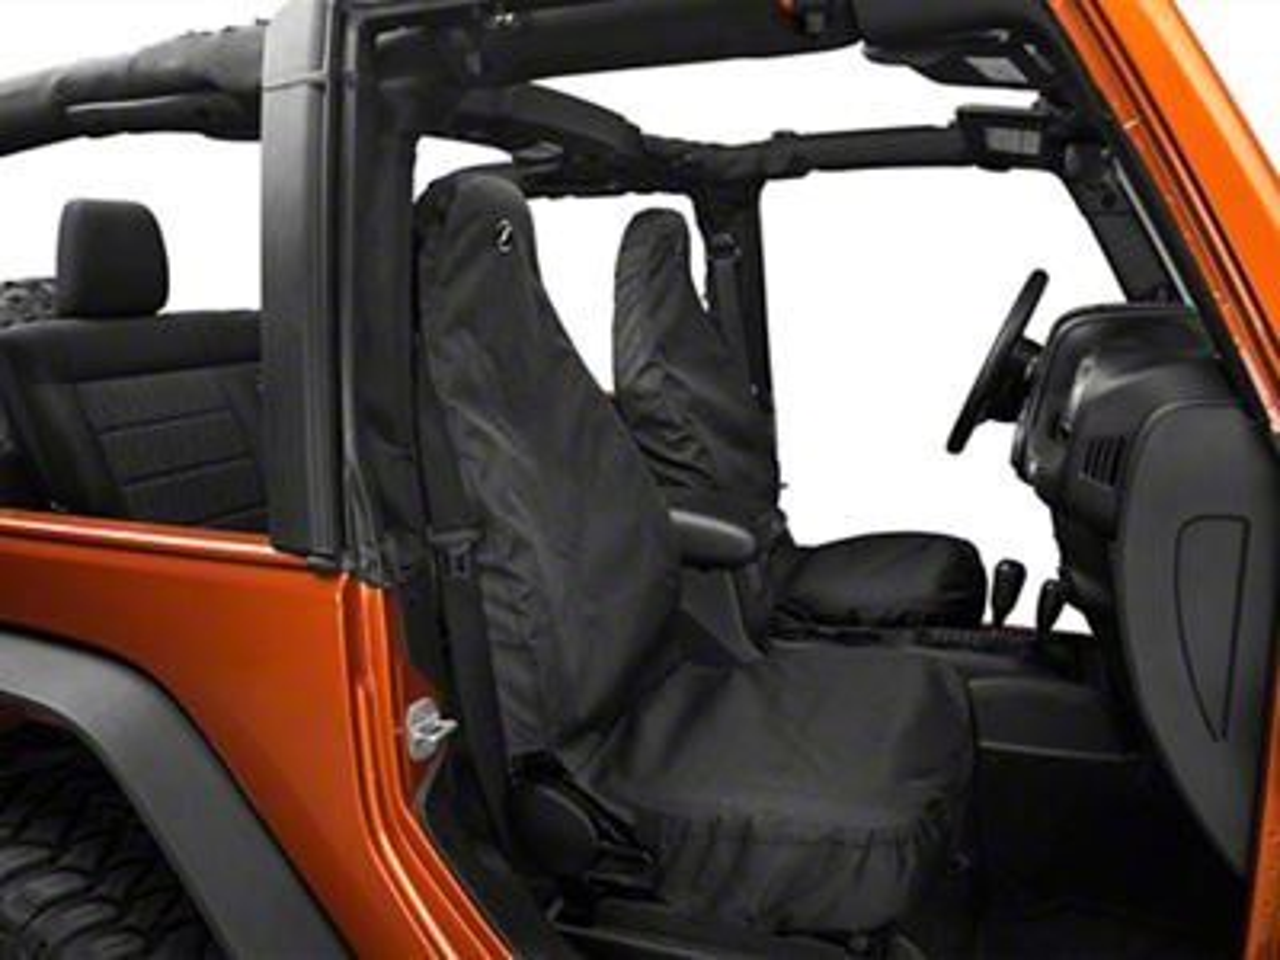 Corbeau Moab Protective Seat Saver (87-19 Jeep Wrangler YJ, TJ, JK & JL)